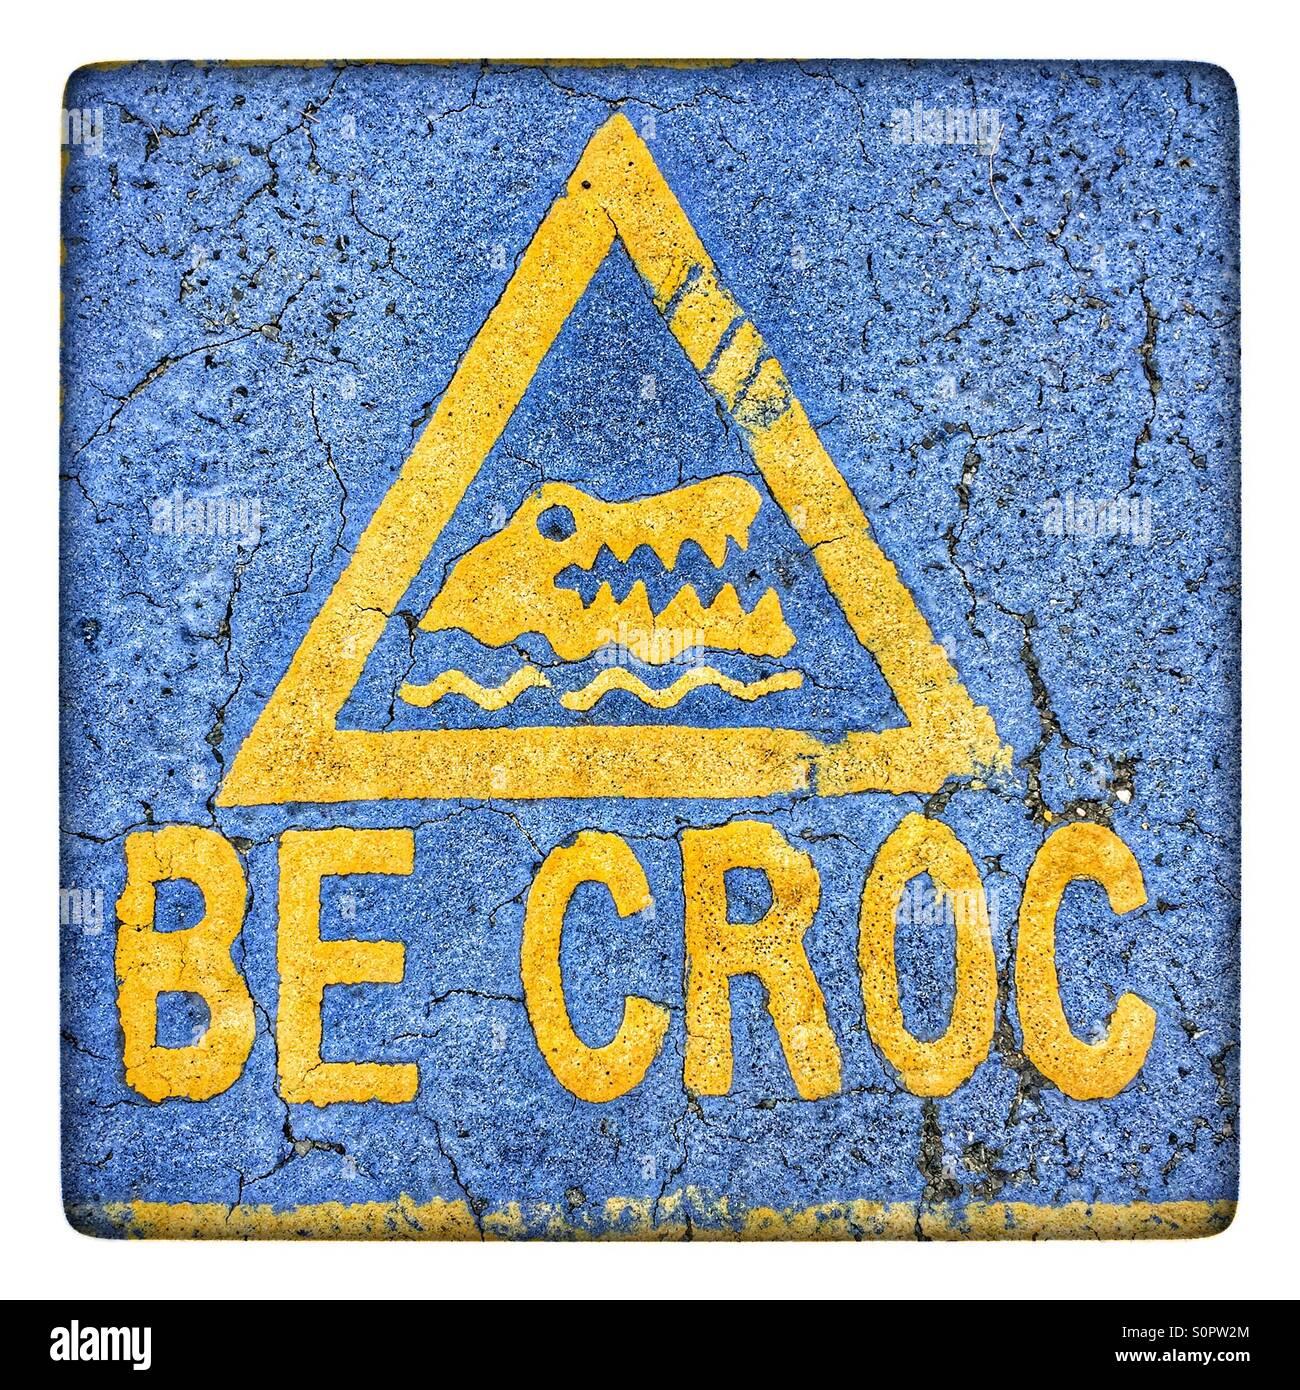 Be Croc - Stock Image